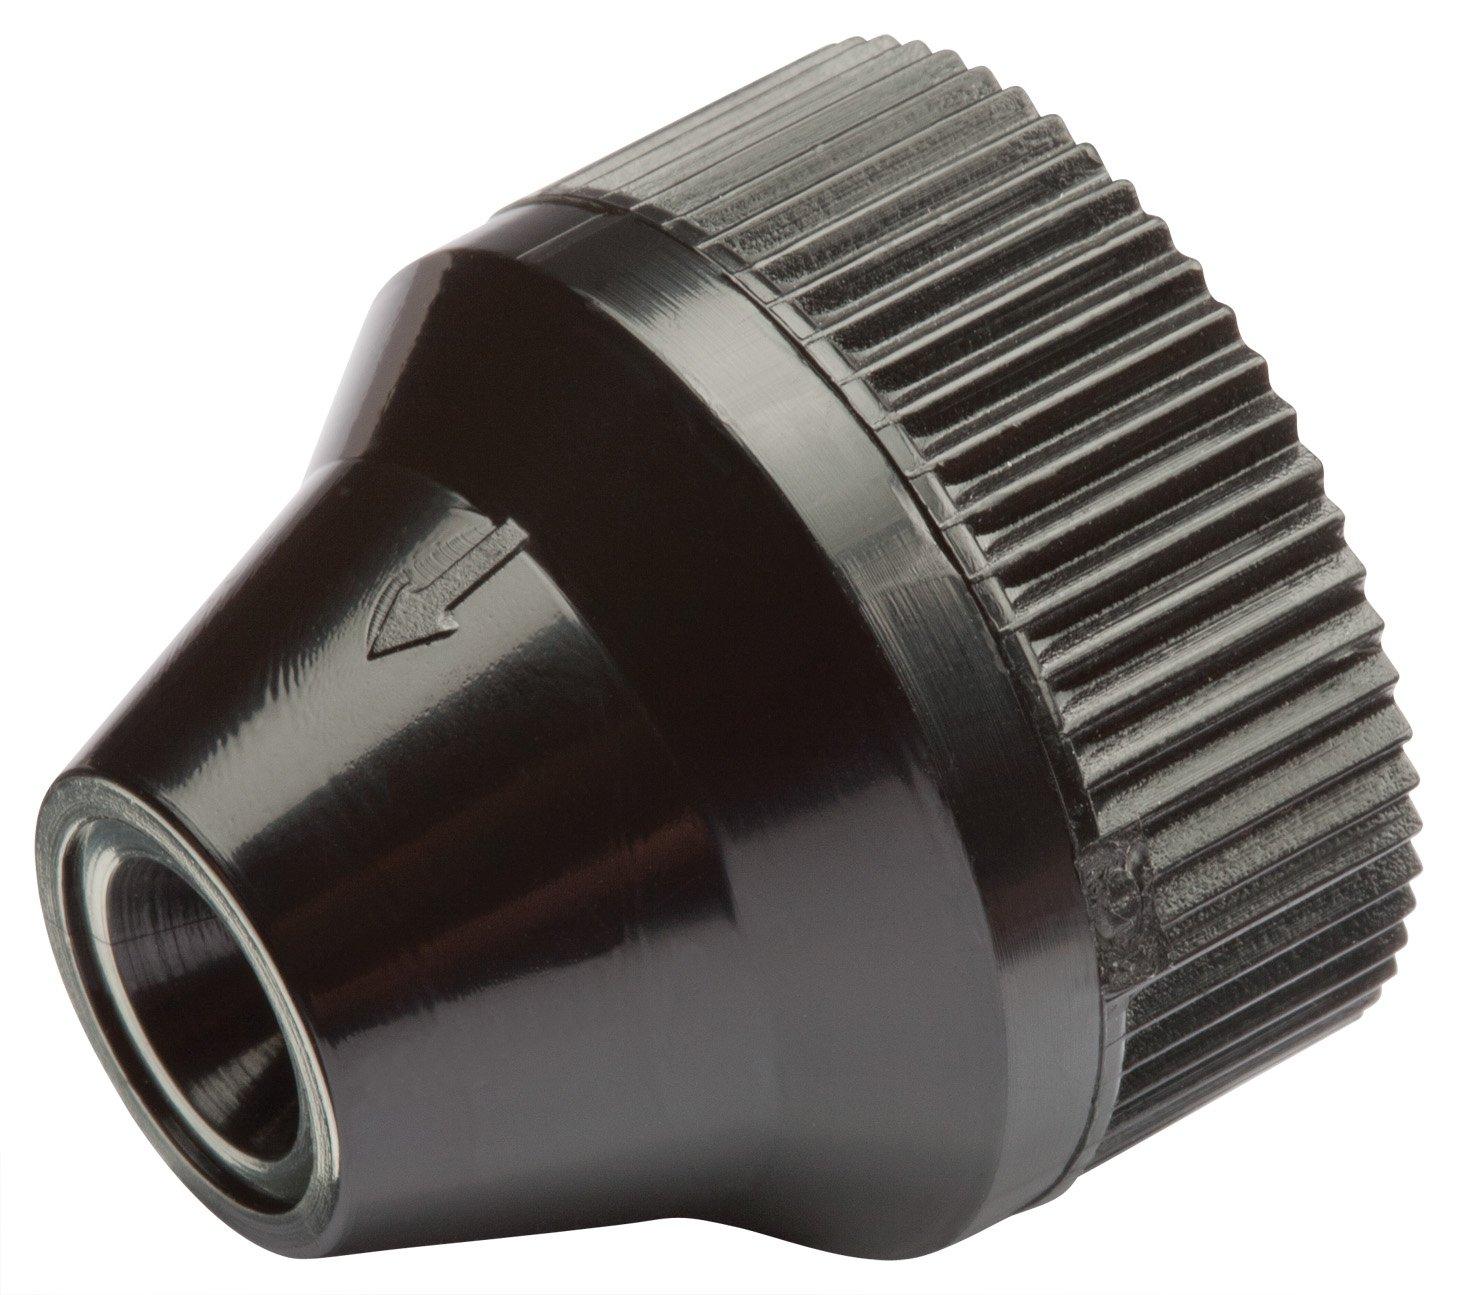 Amazon.com : Rain Bird HE025DPS Drip Irrigation Faucet Adapter, 3/4 ...